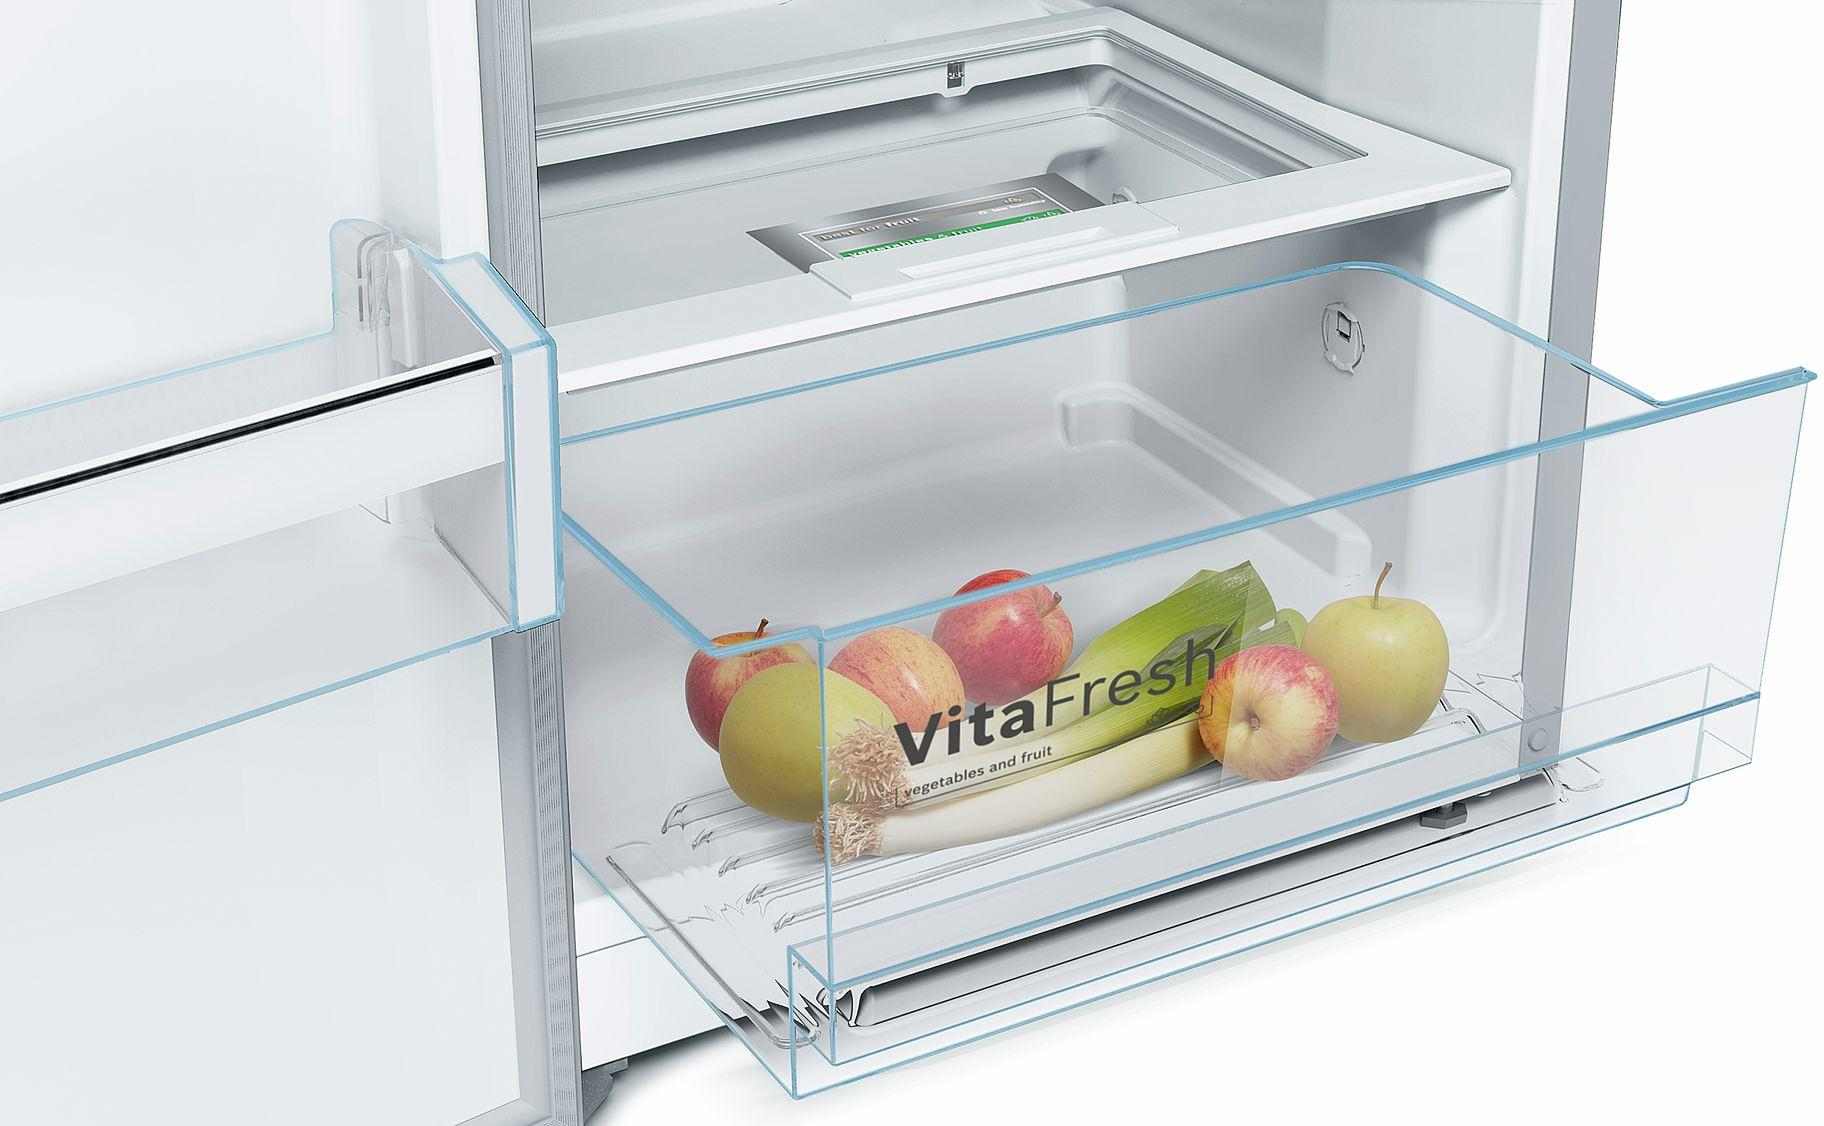 Bosch Kühlschrank Qualität : Bosch ksv36vl4p a kühlschrank freshsense super kühlen